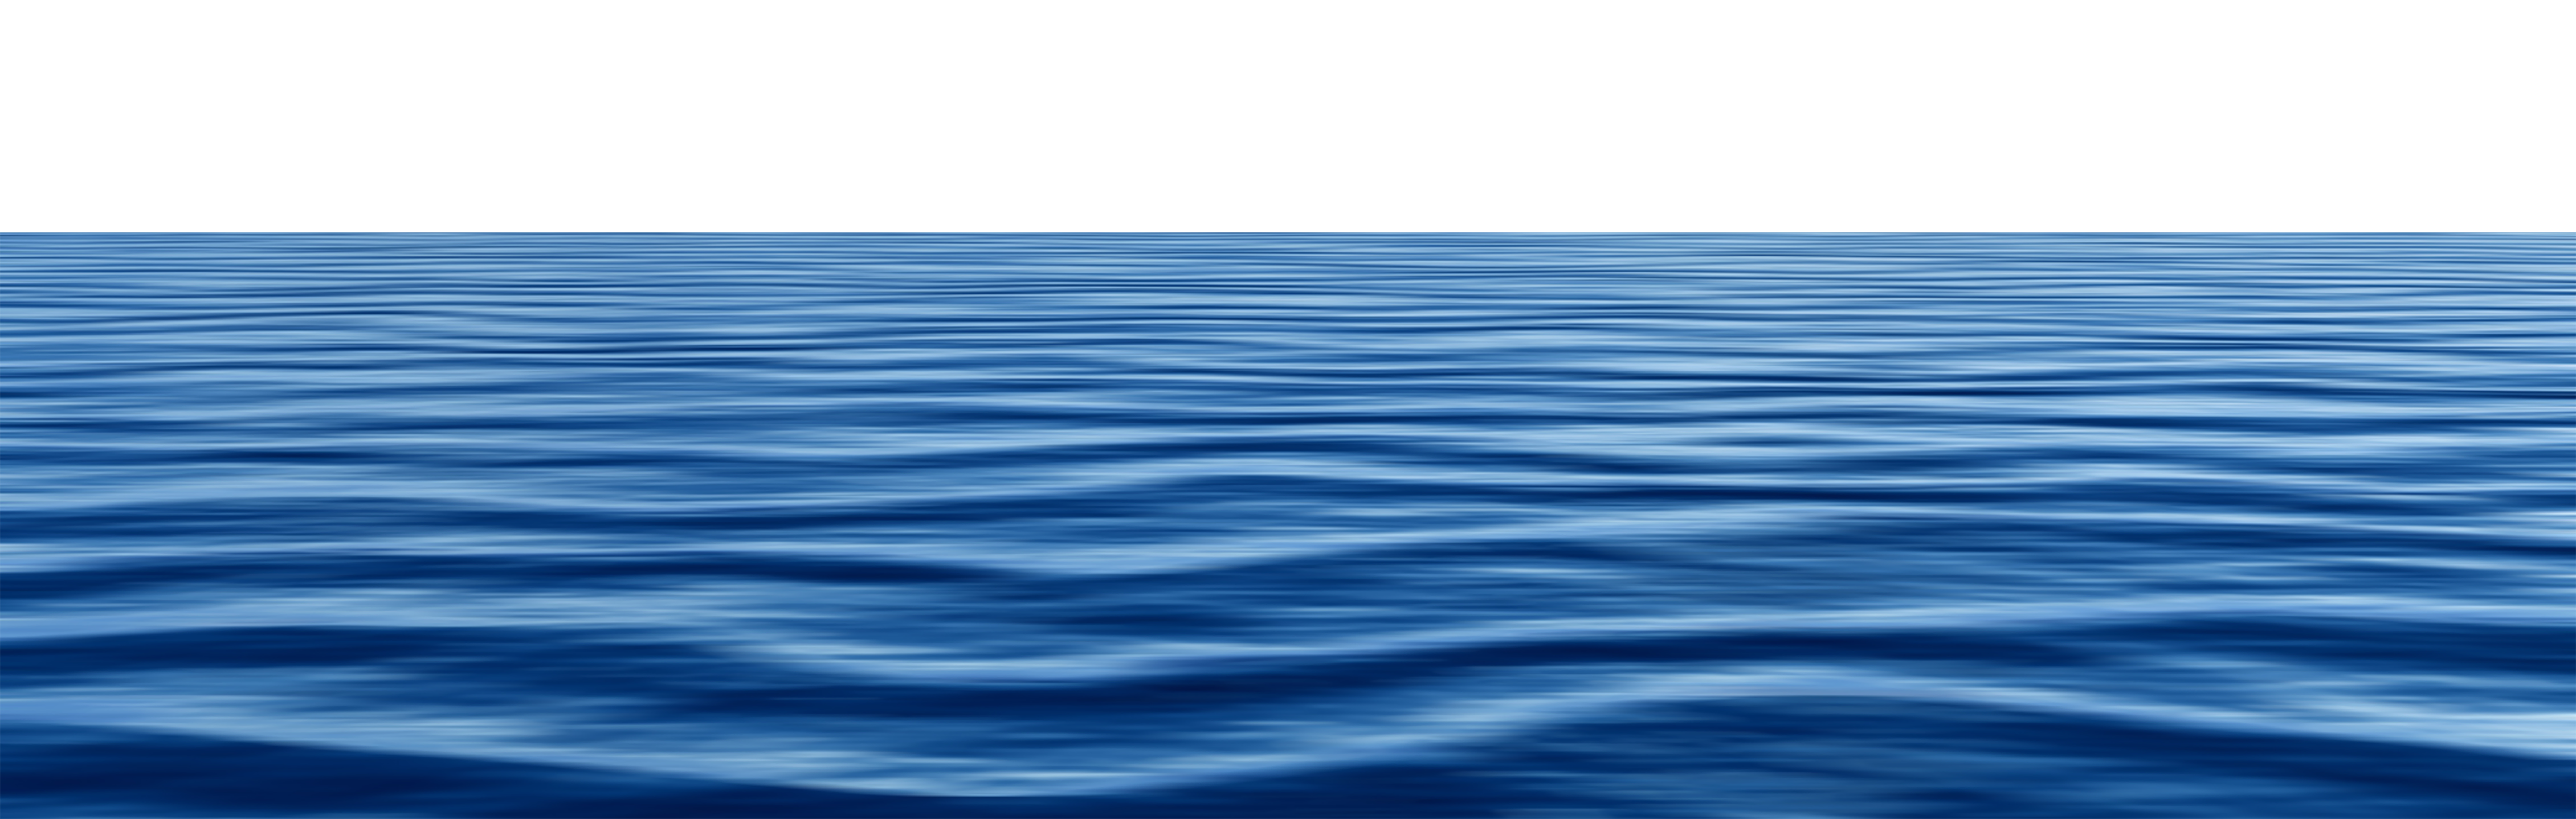 Sea PNG Image